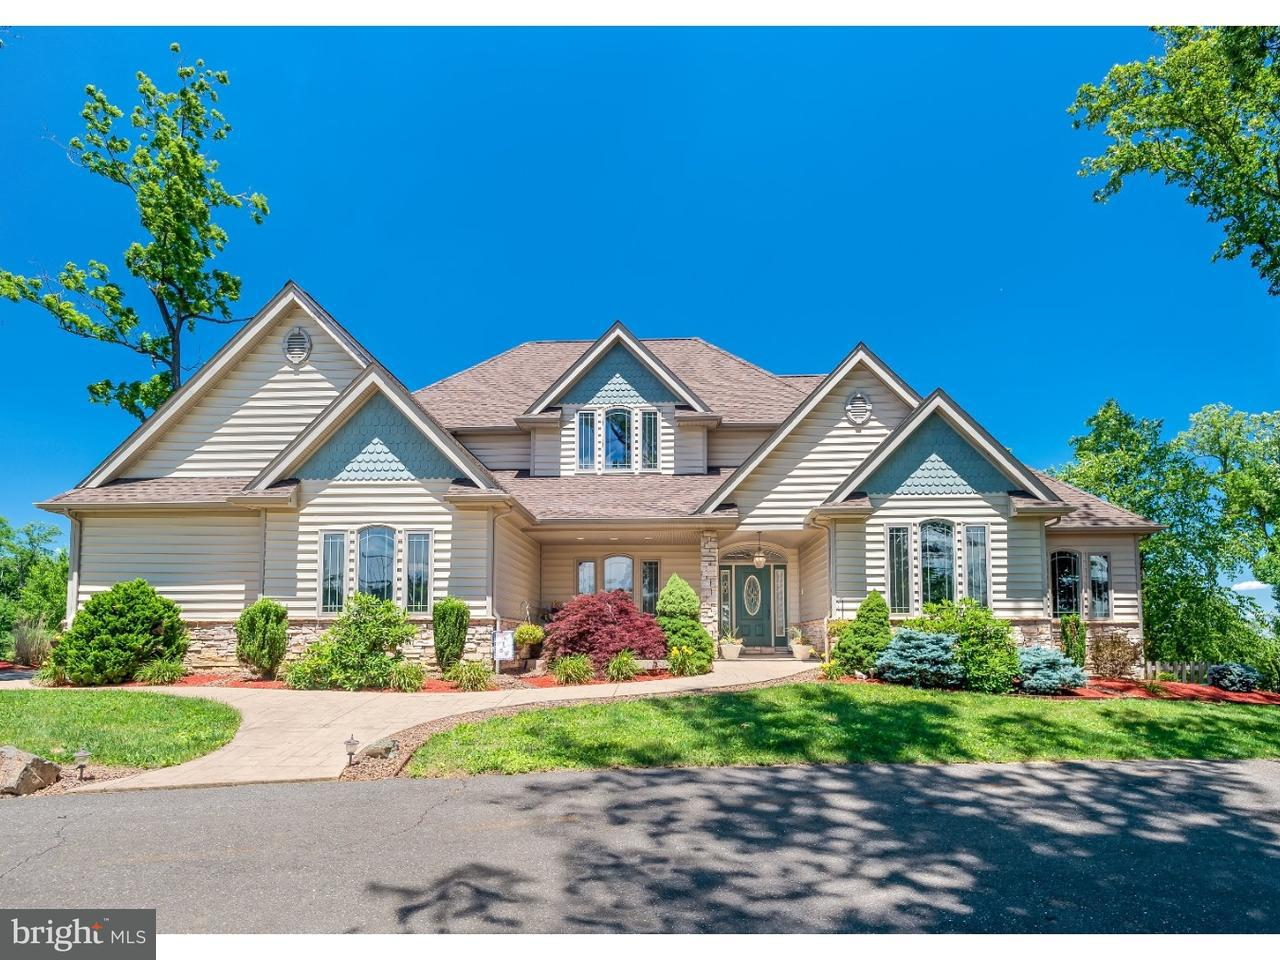 独户住宅 为 销售 在 122 ARNEYTOWN HORNERSTOWN Road Allentown, 新泽西州 08501 美国在/周边: Upper Freehold Township